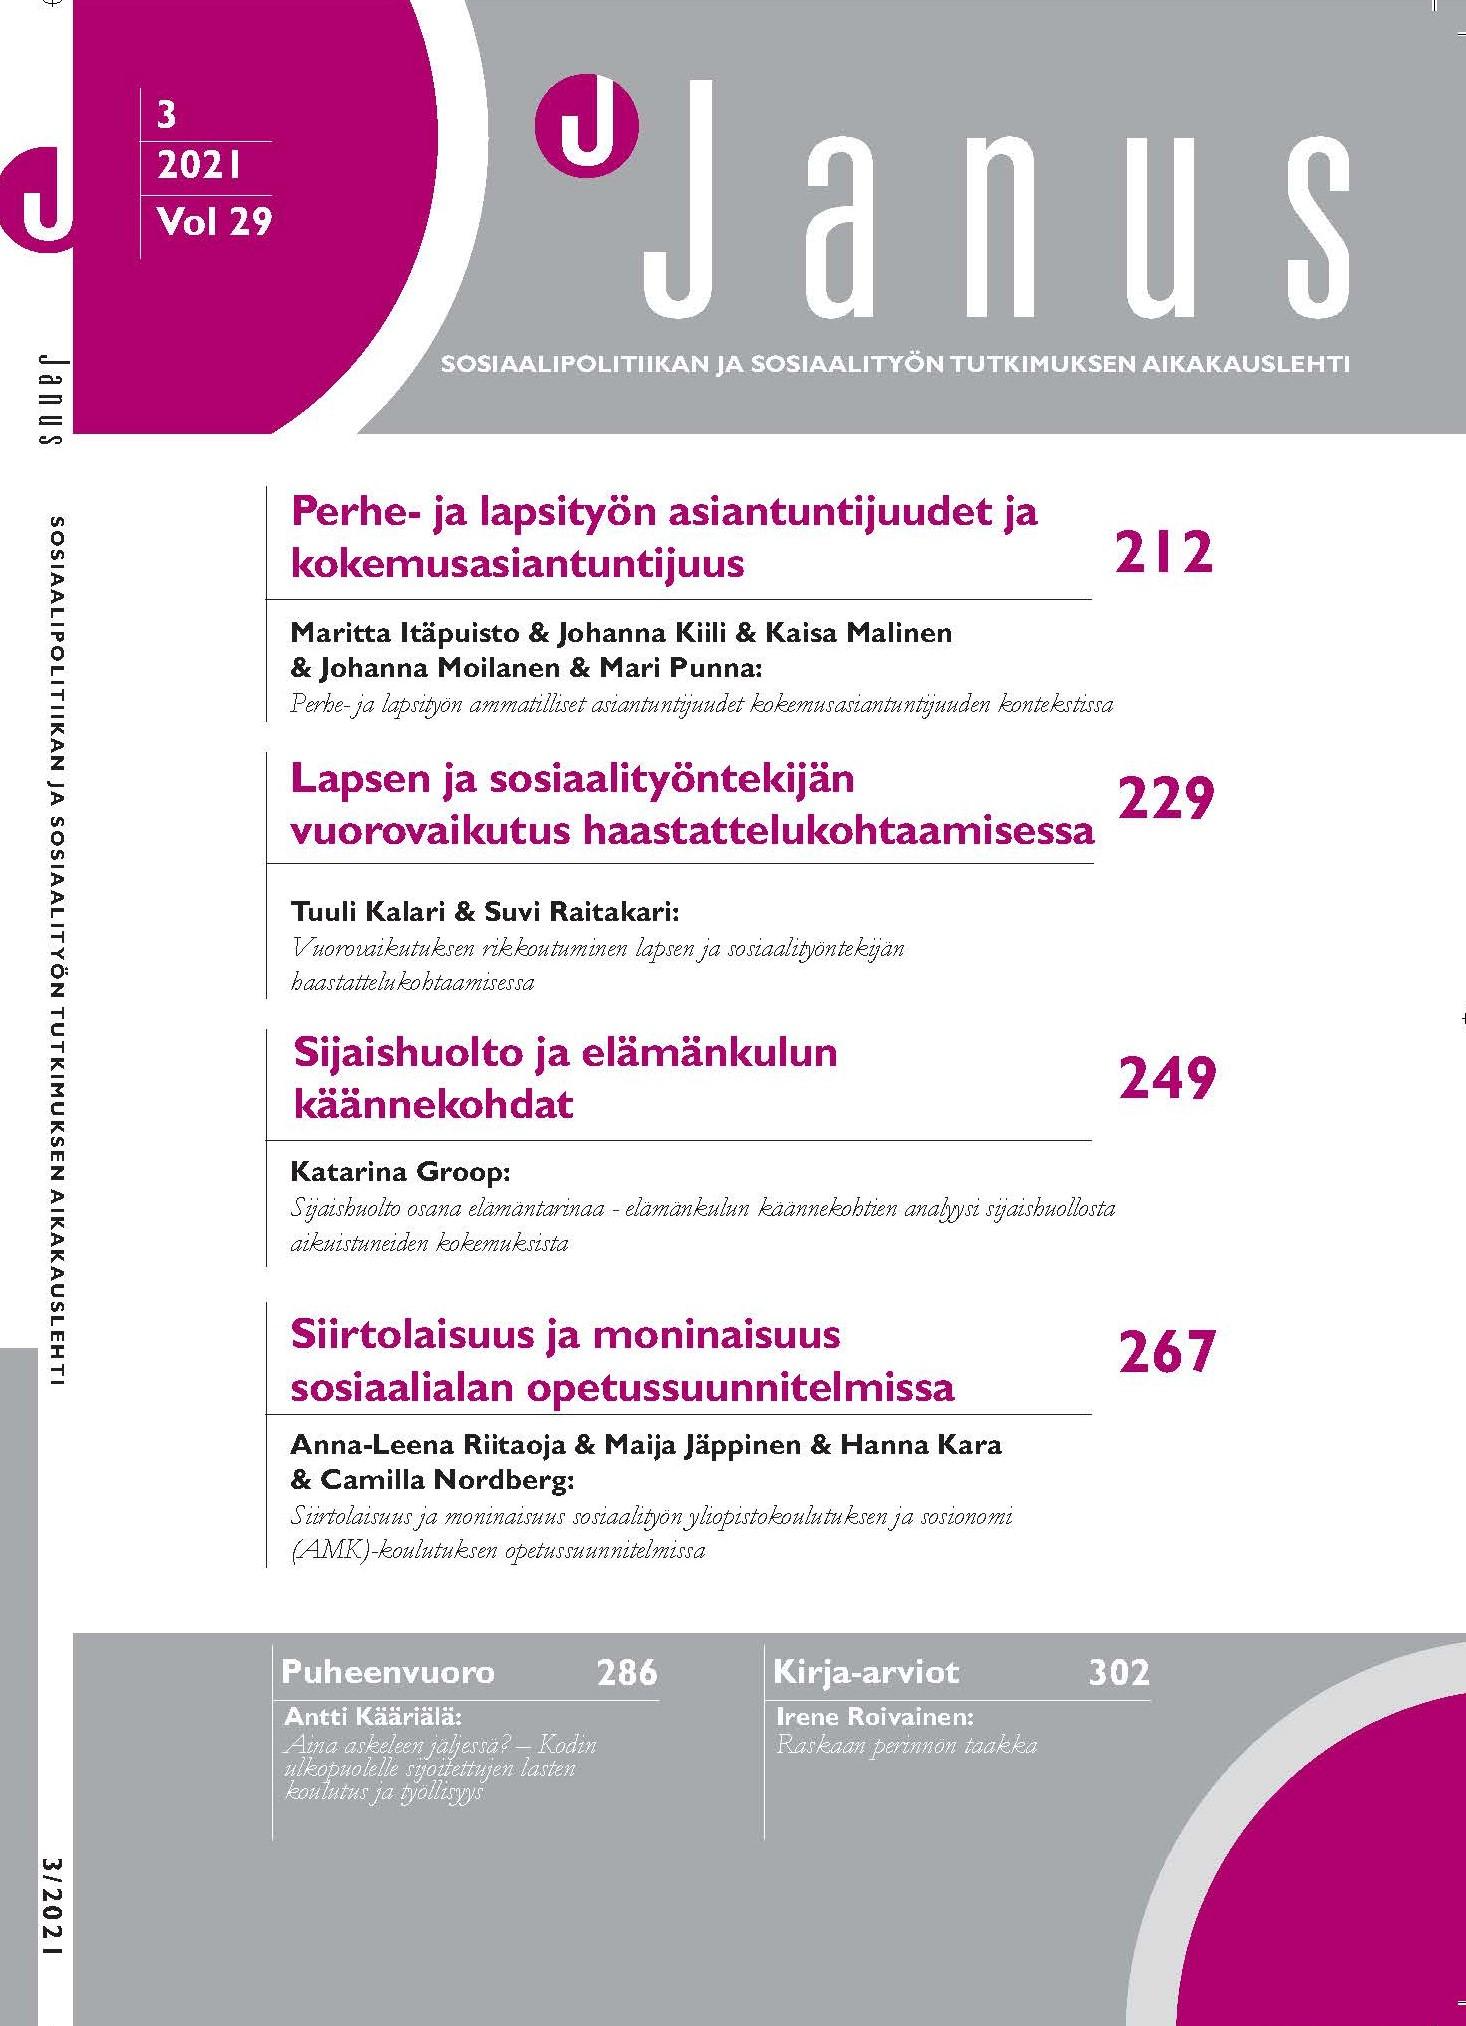 Janus kansilehti 3/2021